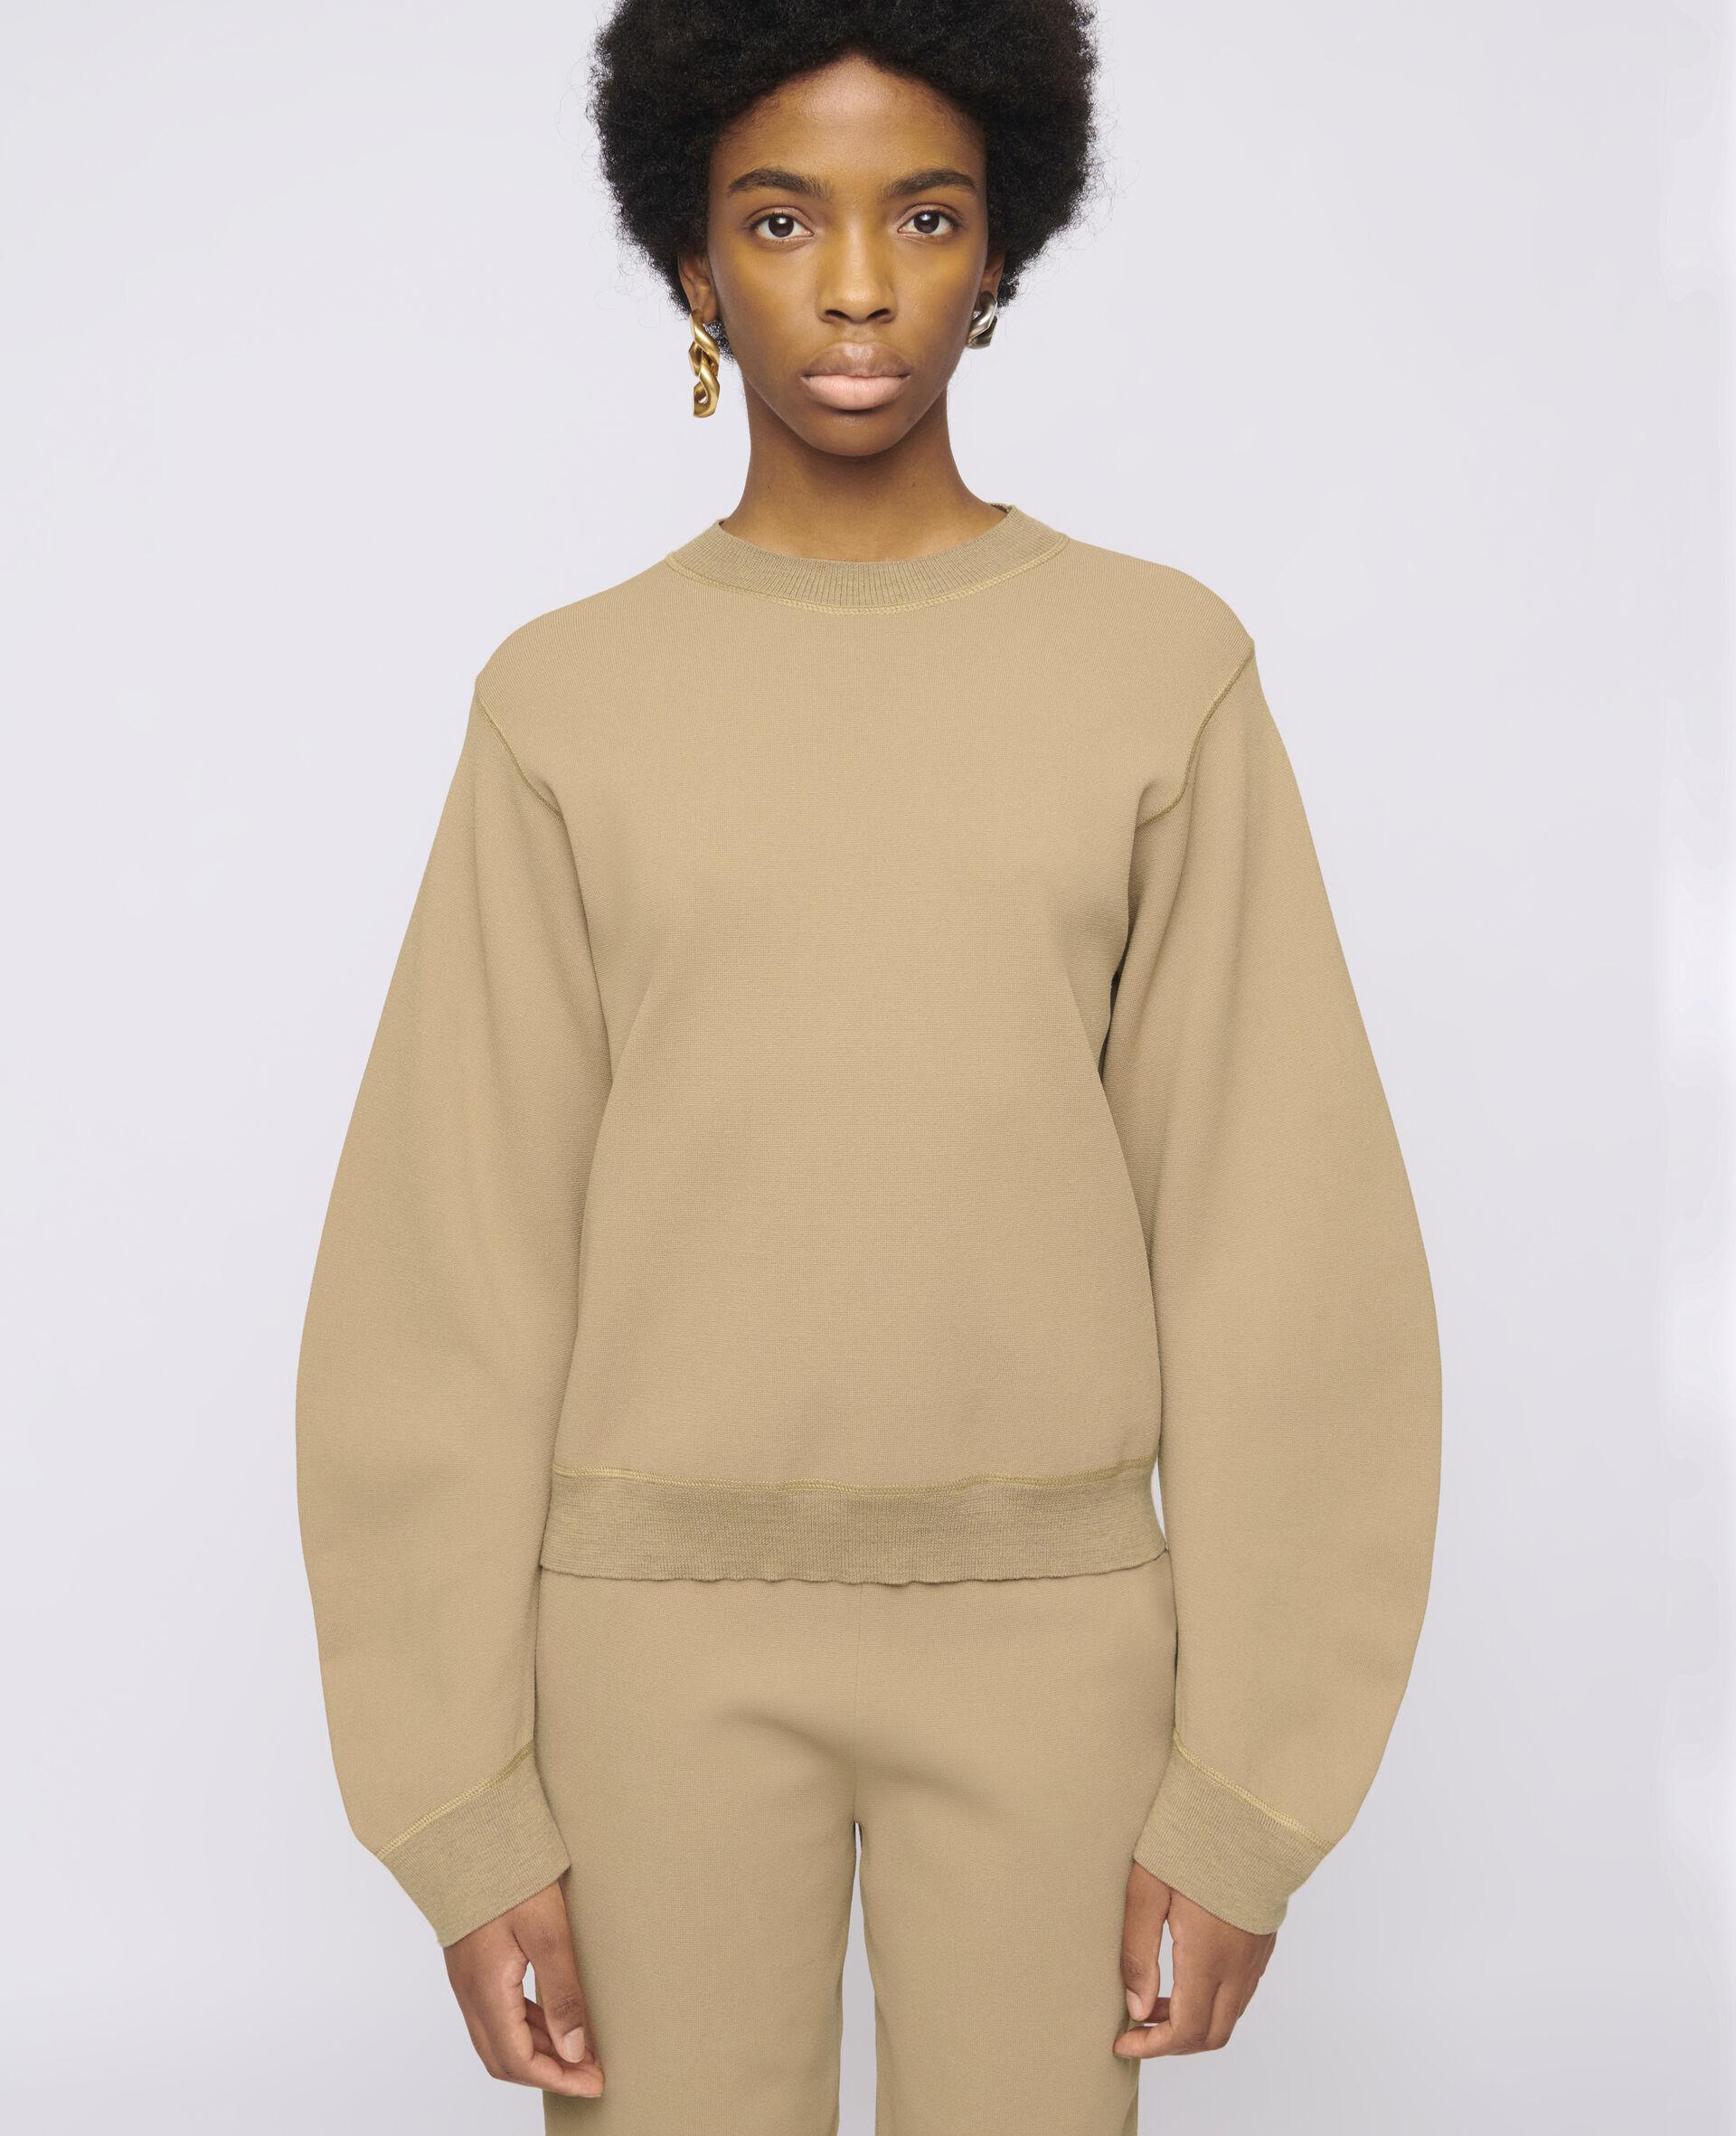 Pullover aus engmaschigem Strick-Brown-large image number 3